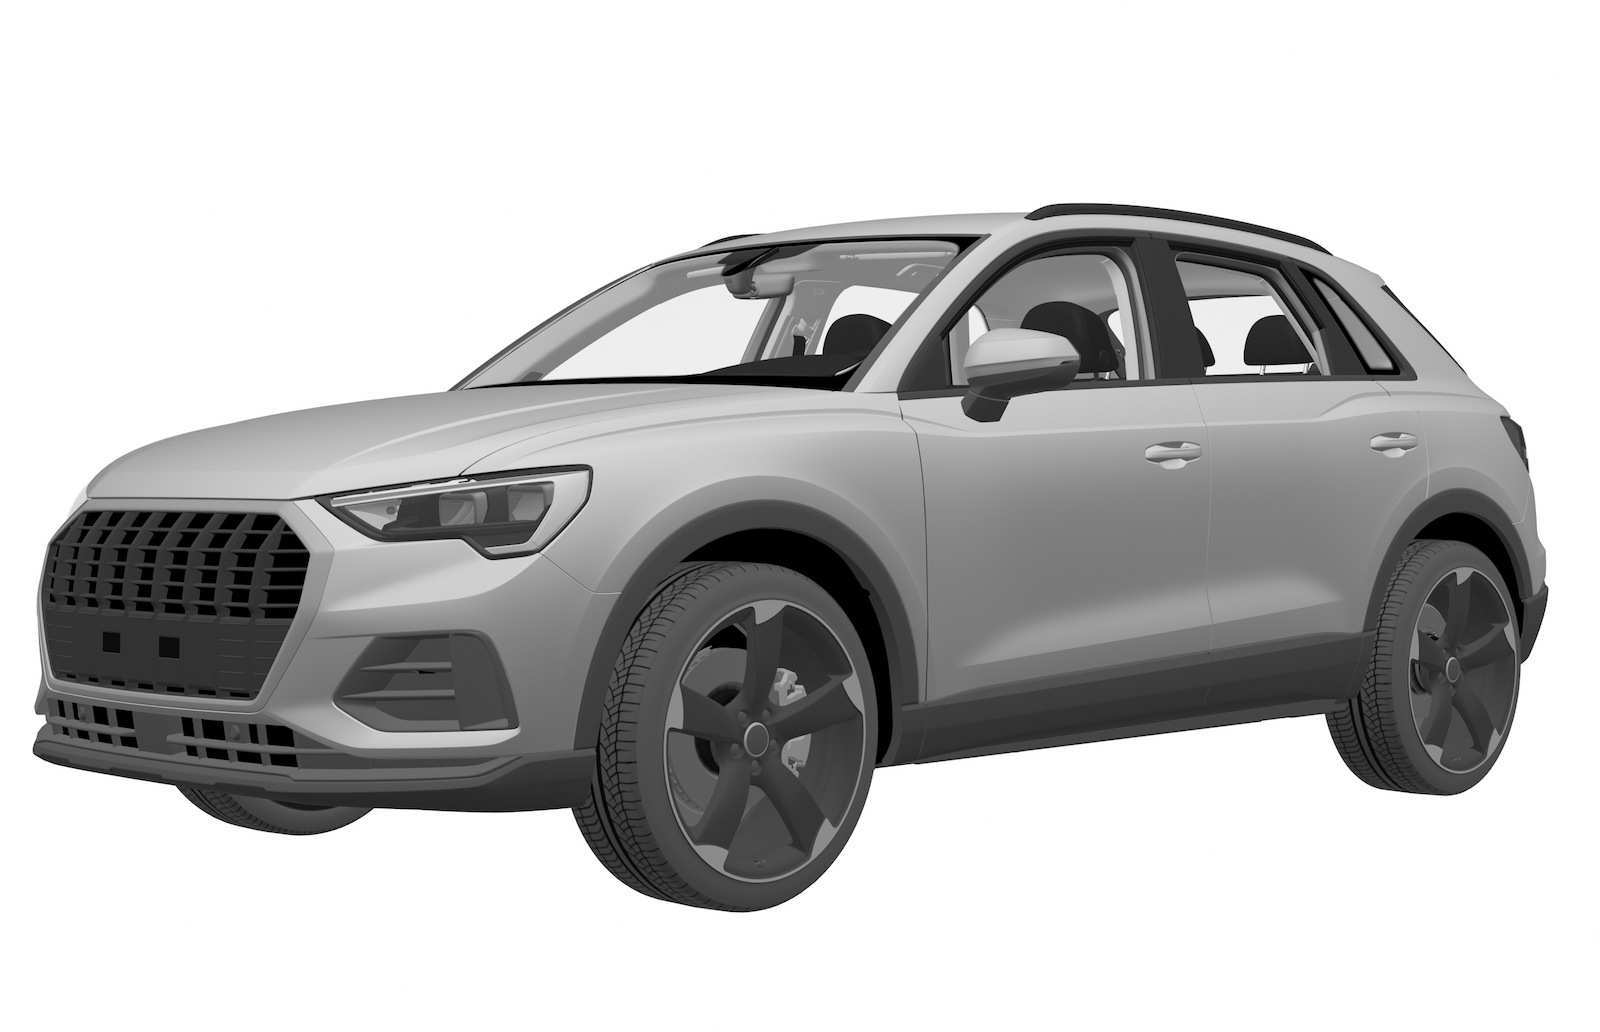 40 Concept of New Audi Q3 2019 Hybrid Price Spesification for New Audi Q3 2019 Hybrid Price